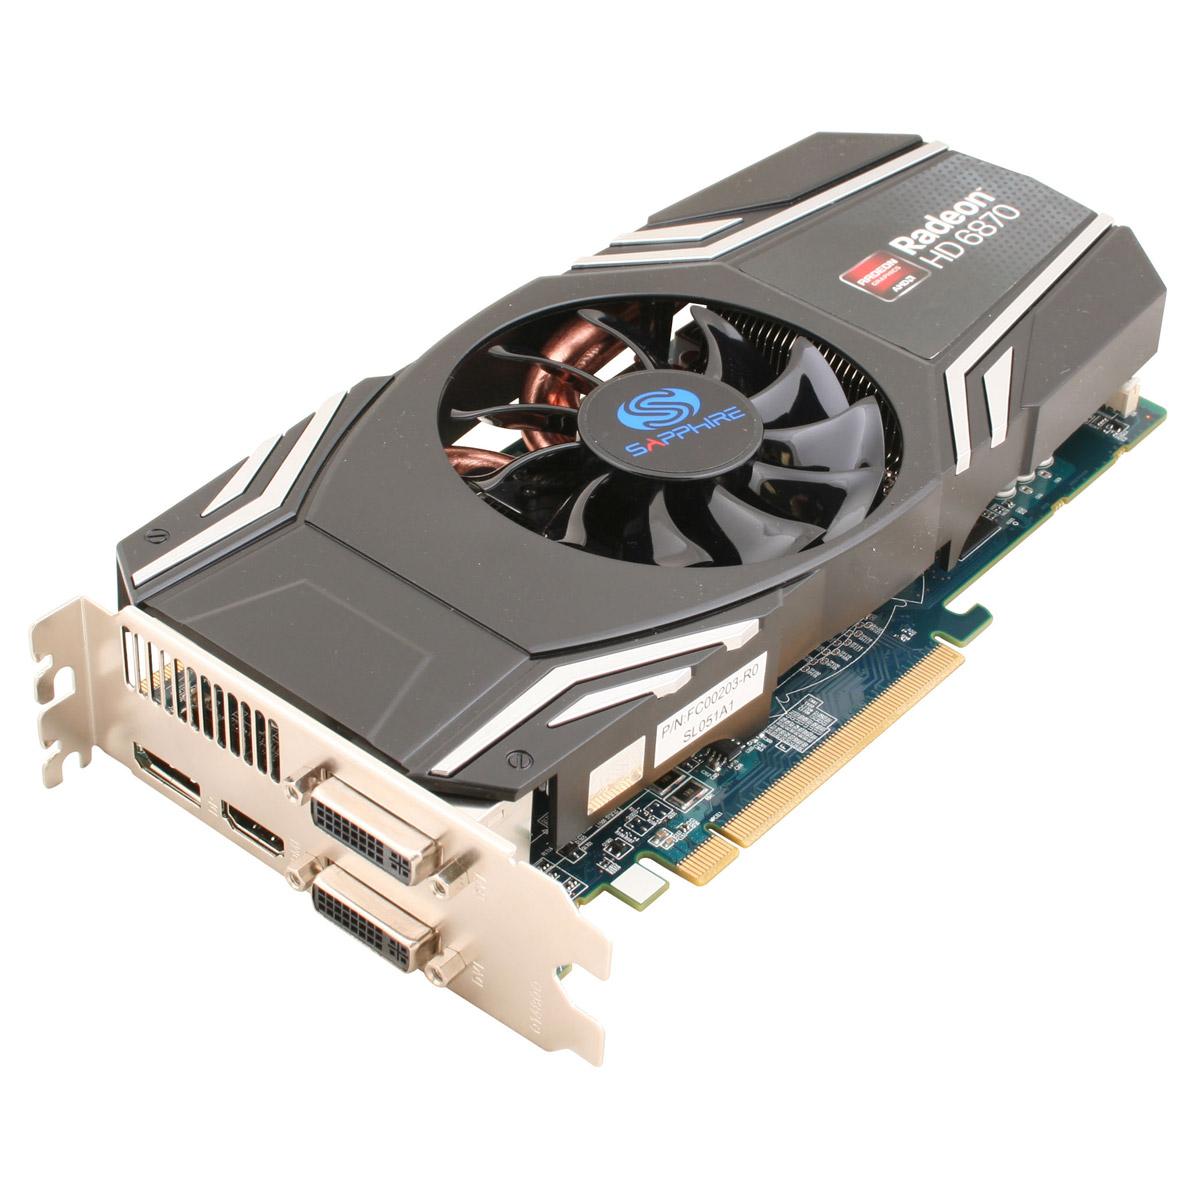 Carte graphique Sapphire Radeon HD 6870 1 GB 1 Go HDMI/Dual DVI/DisplayPort - PCI Express (AMD Radeon HD 6870)